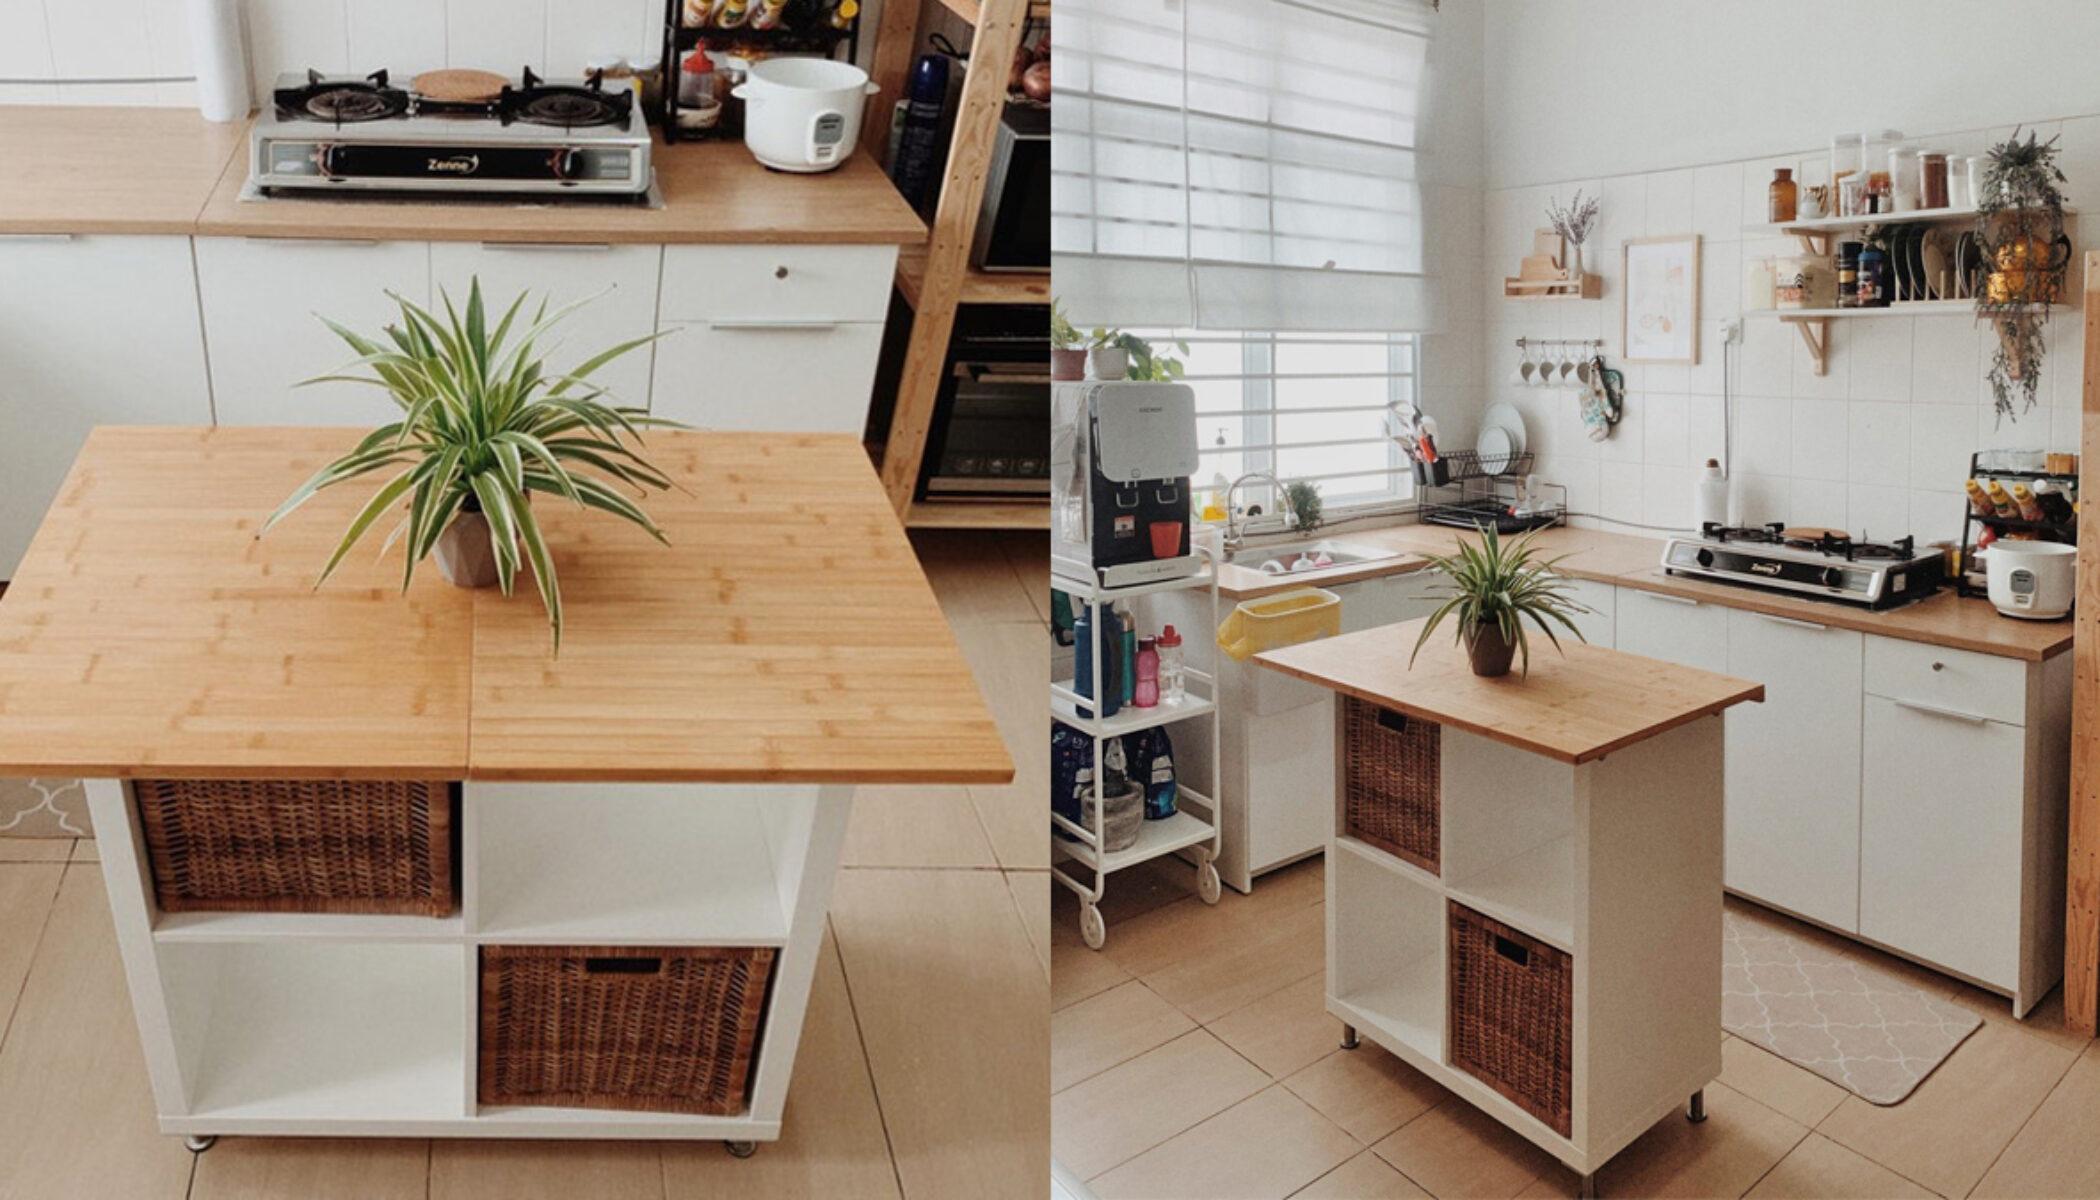 Ikea Kitchen Accessories Malaysia - Home Decor